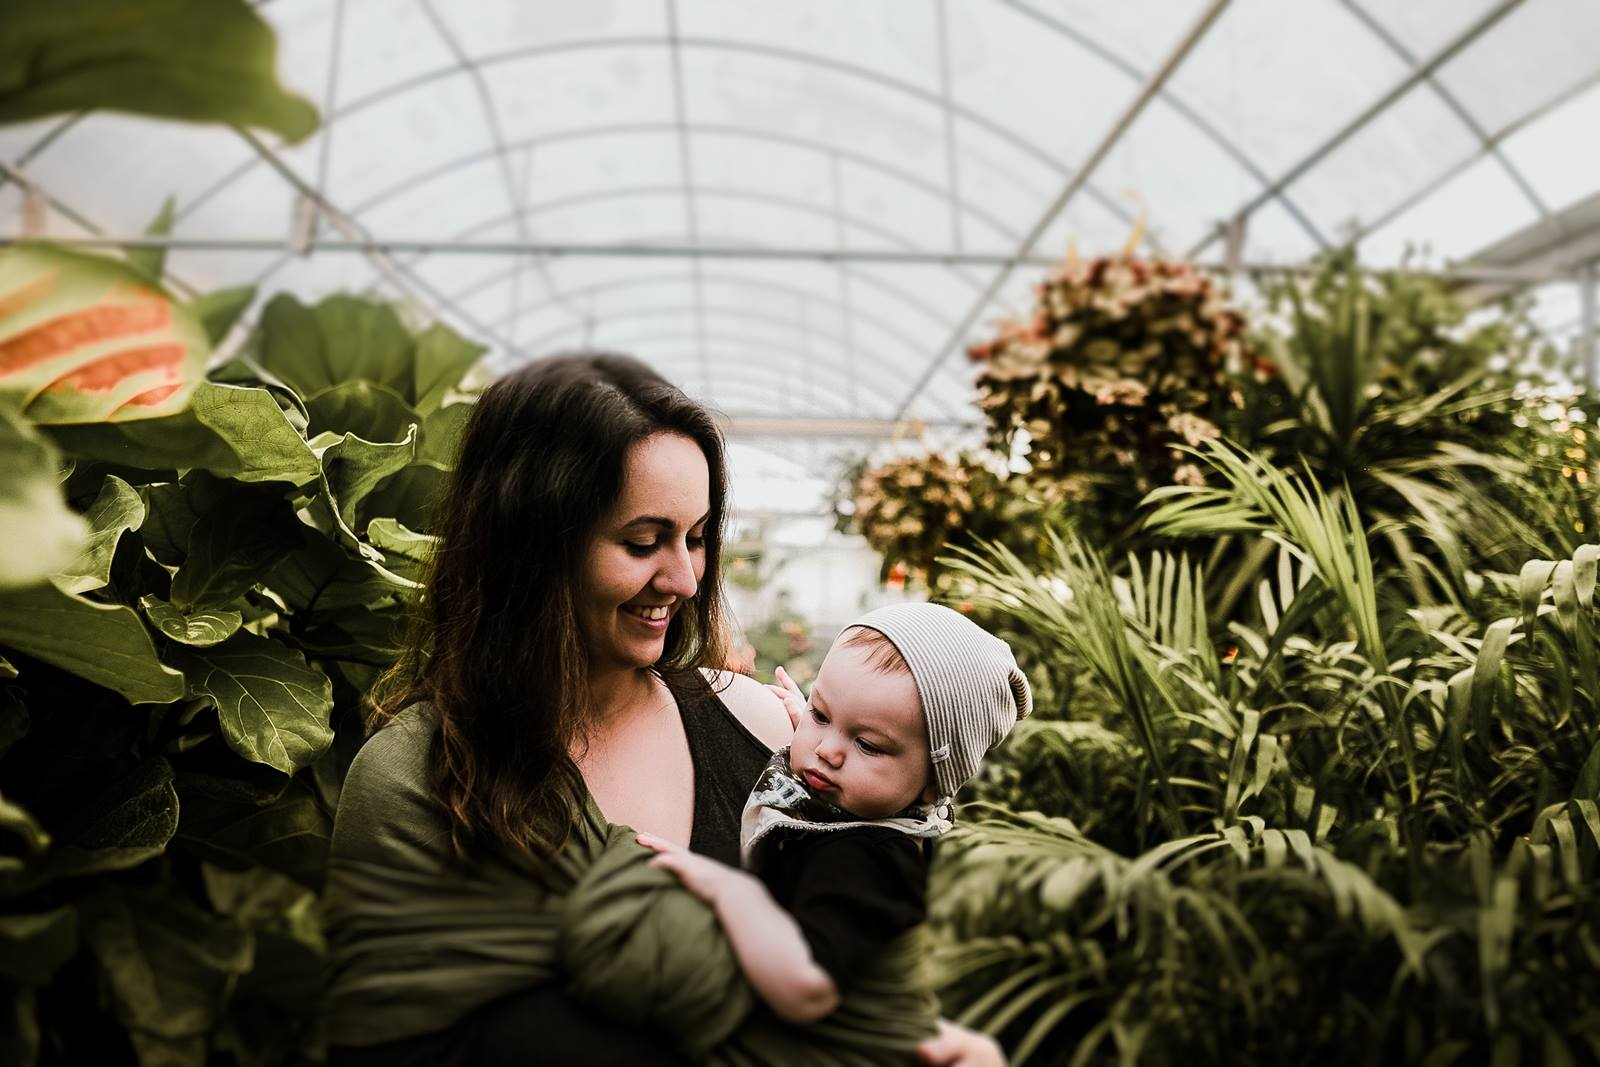 Postpartum Depression: A Message of Hope